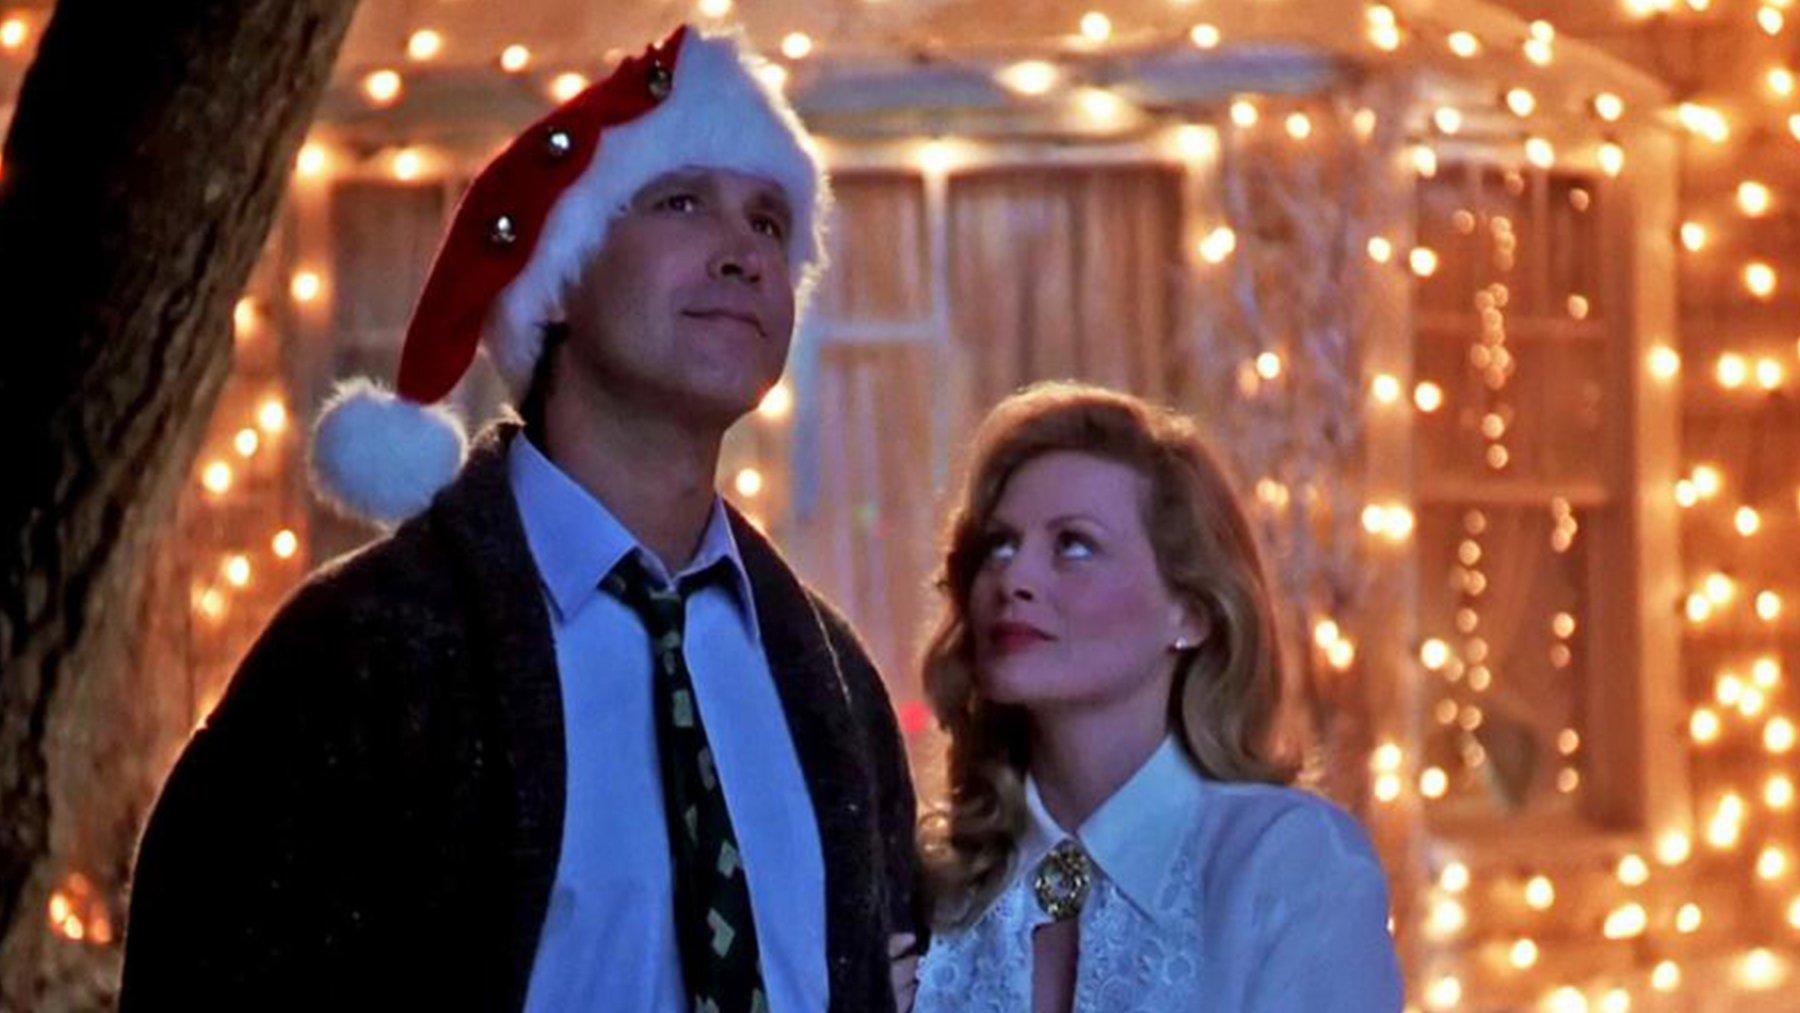 Metaflix Happy Holidays